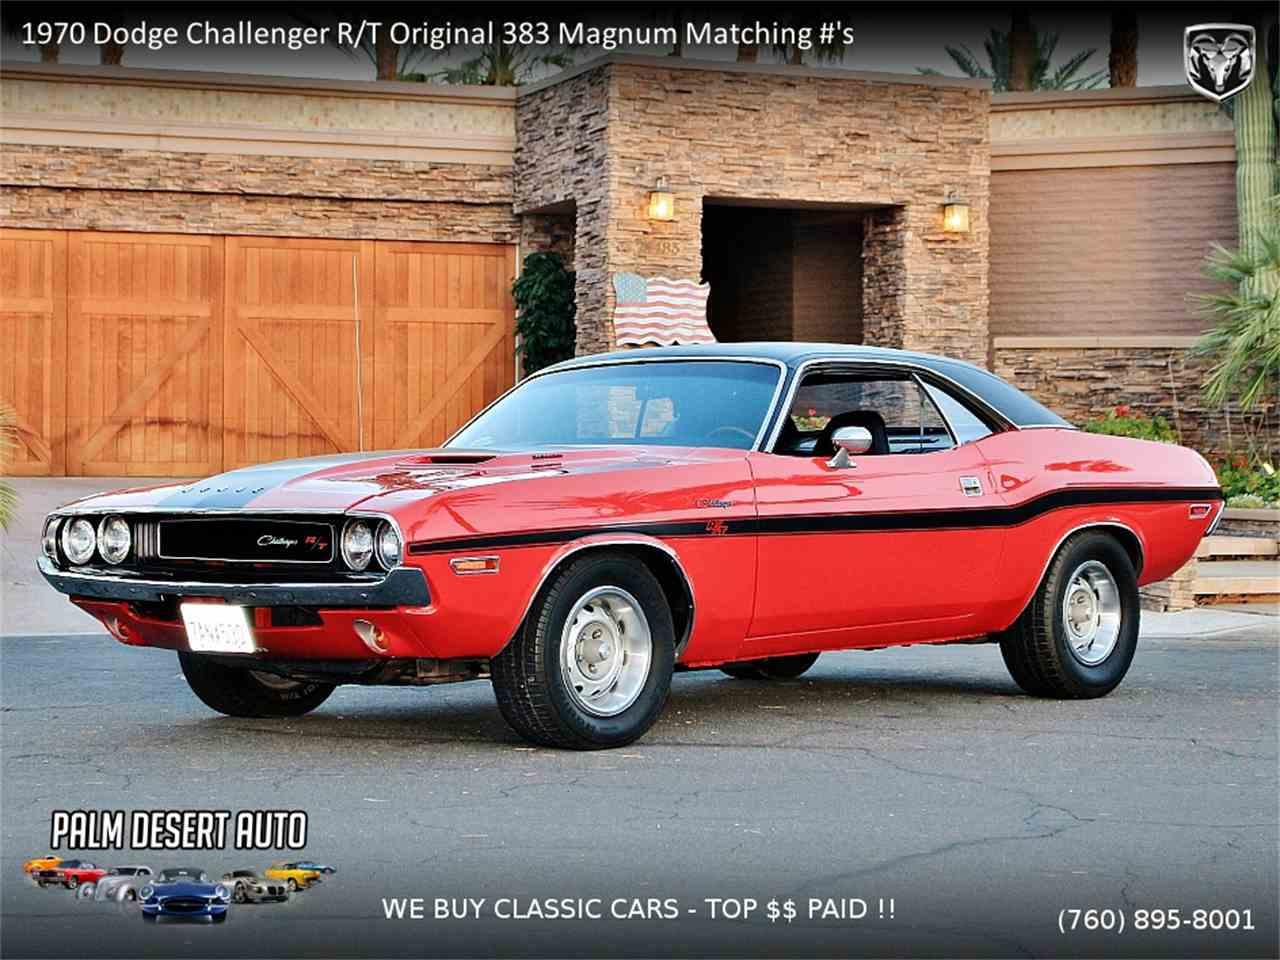 1970 Dodge Challenger R/T for Sale | ClassicCars.com | CC-1085781